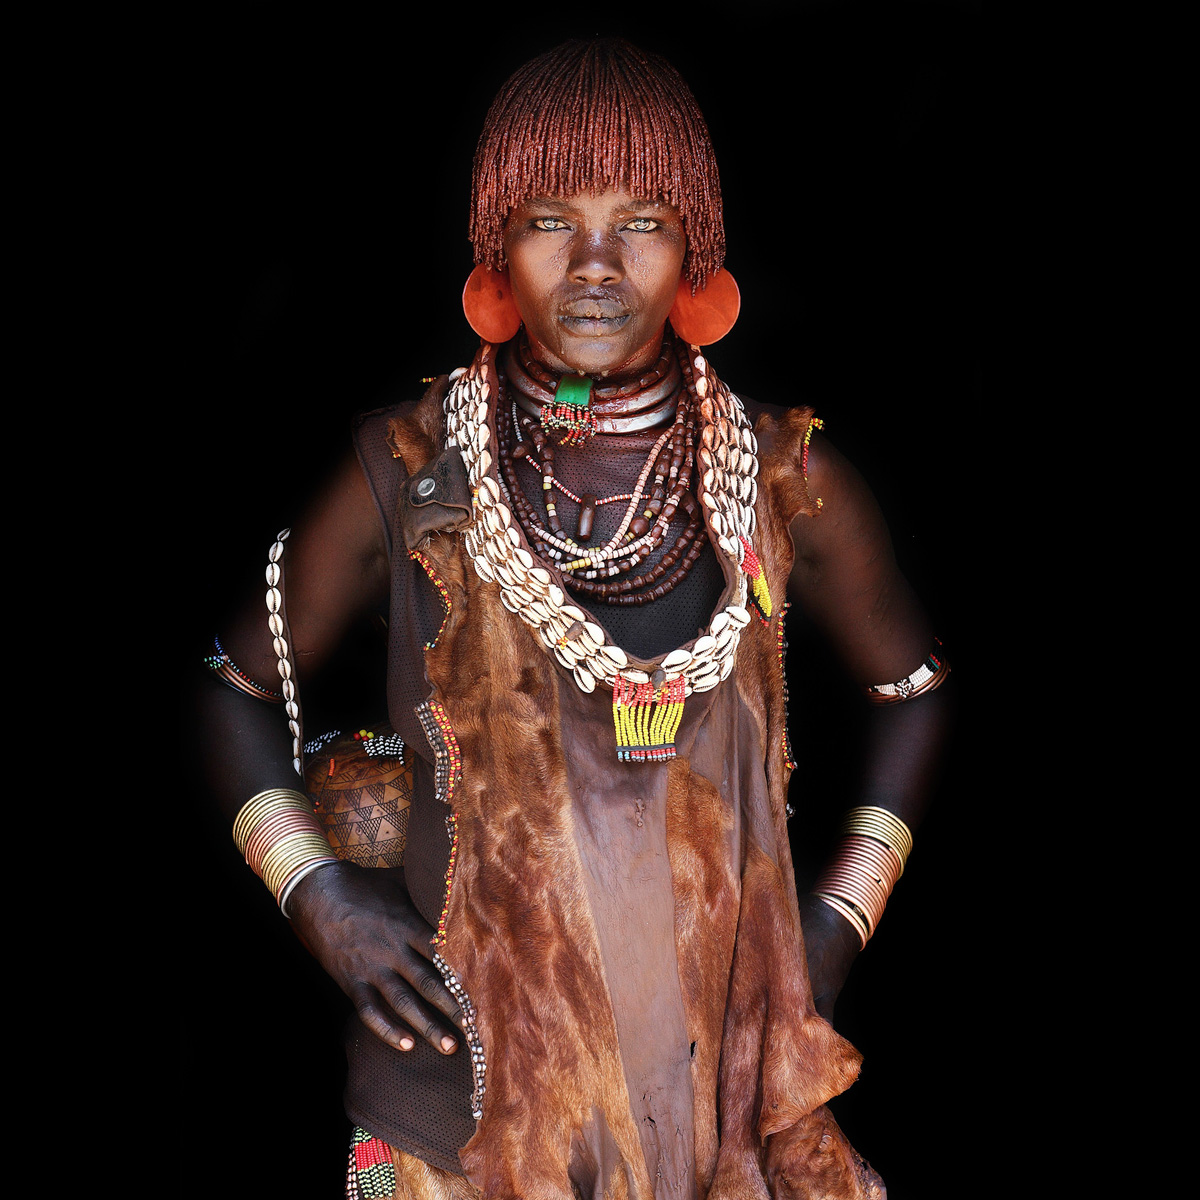 Preteem tribal nudes, free tied down bdsm video